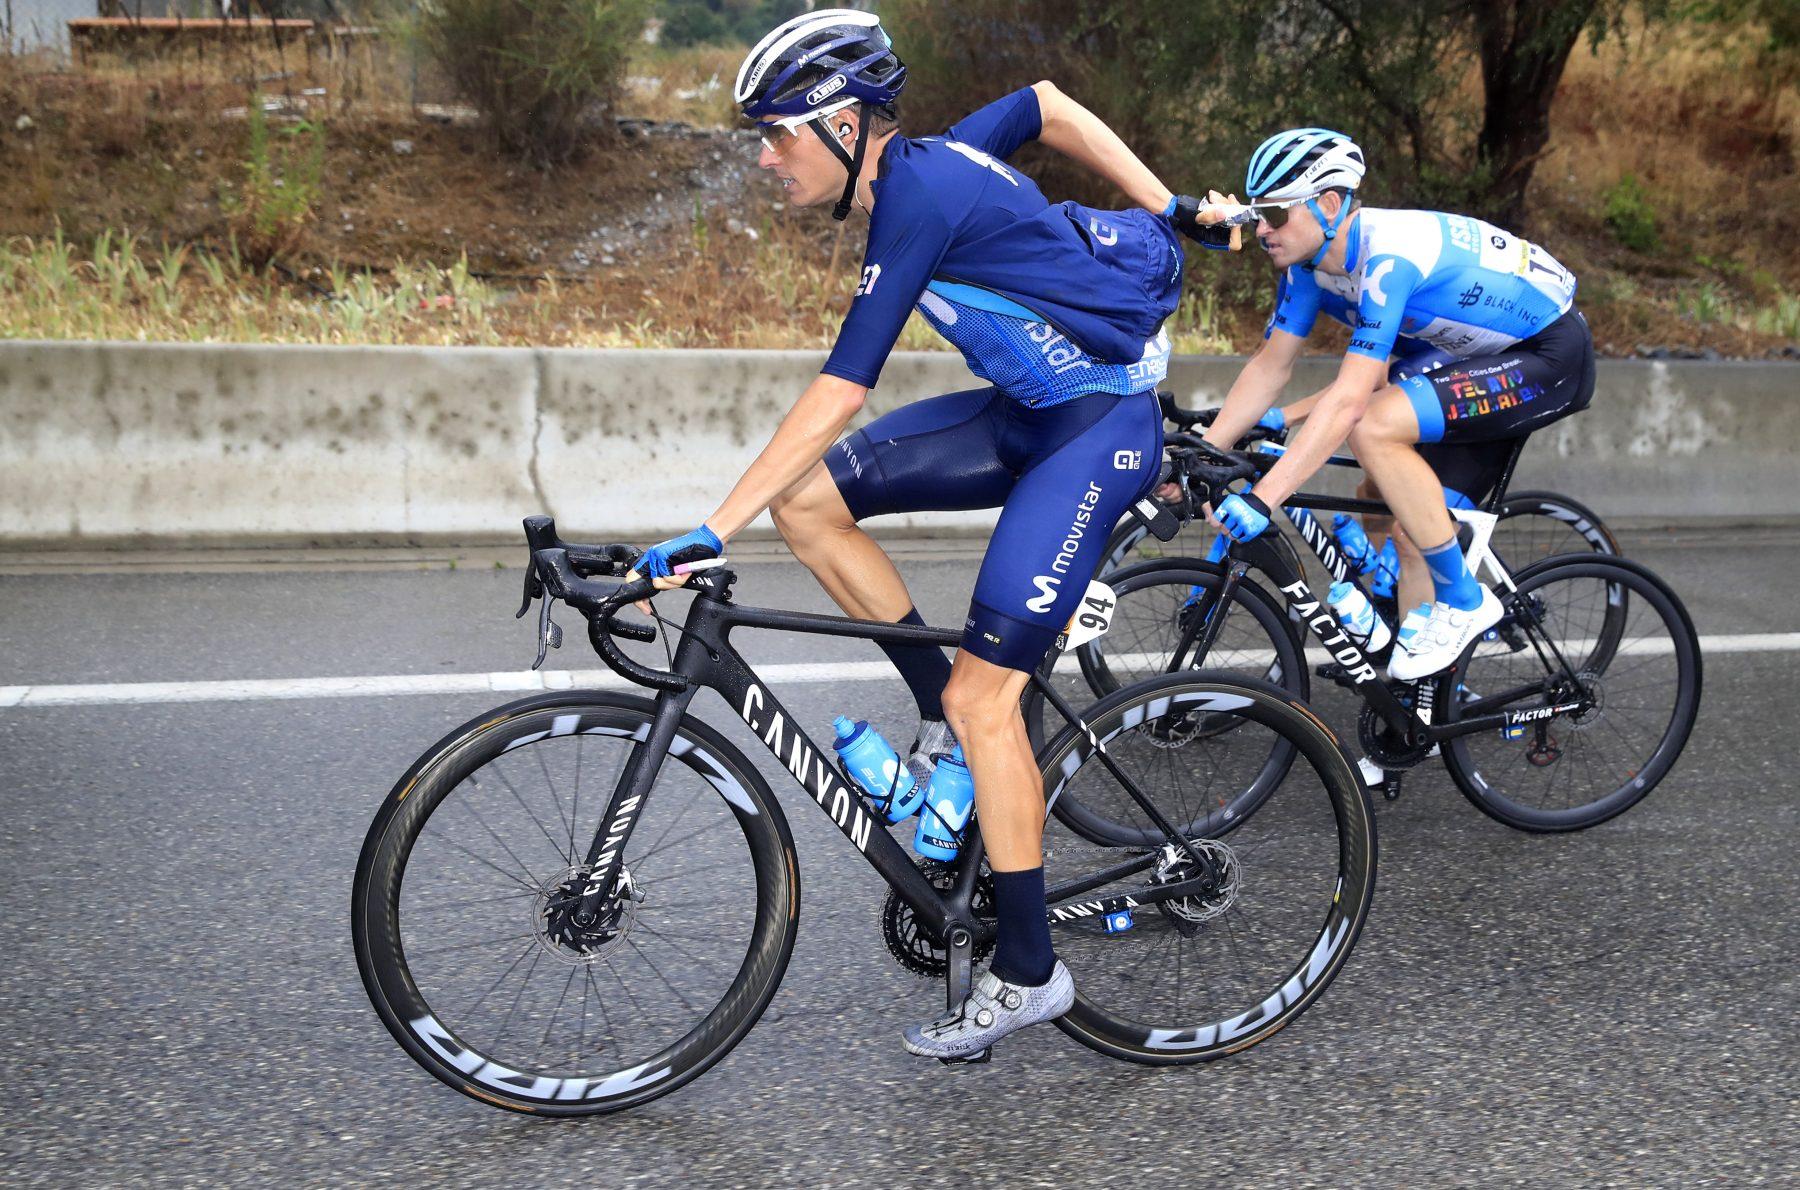 Imagen de la noticia 'Crashes overshadow TDF's opening stage in Nice'